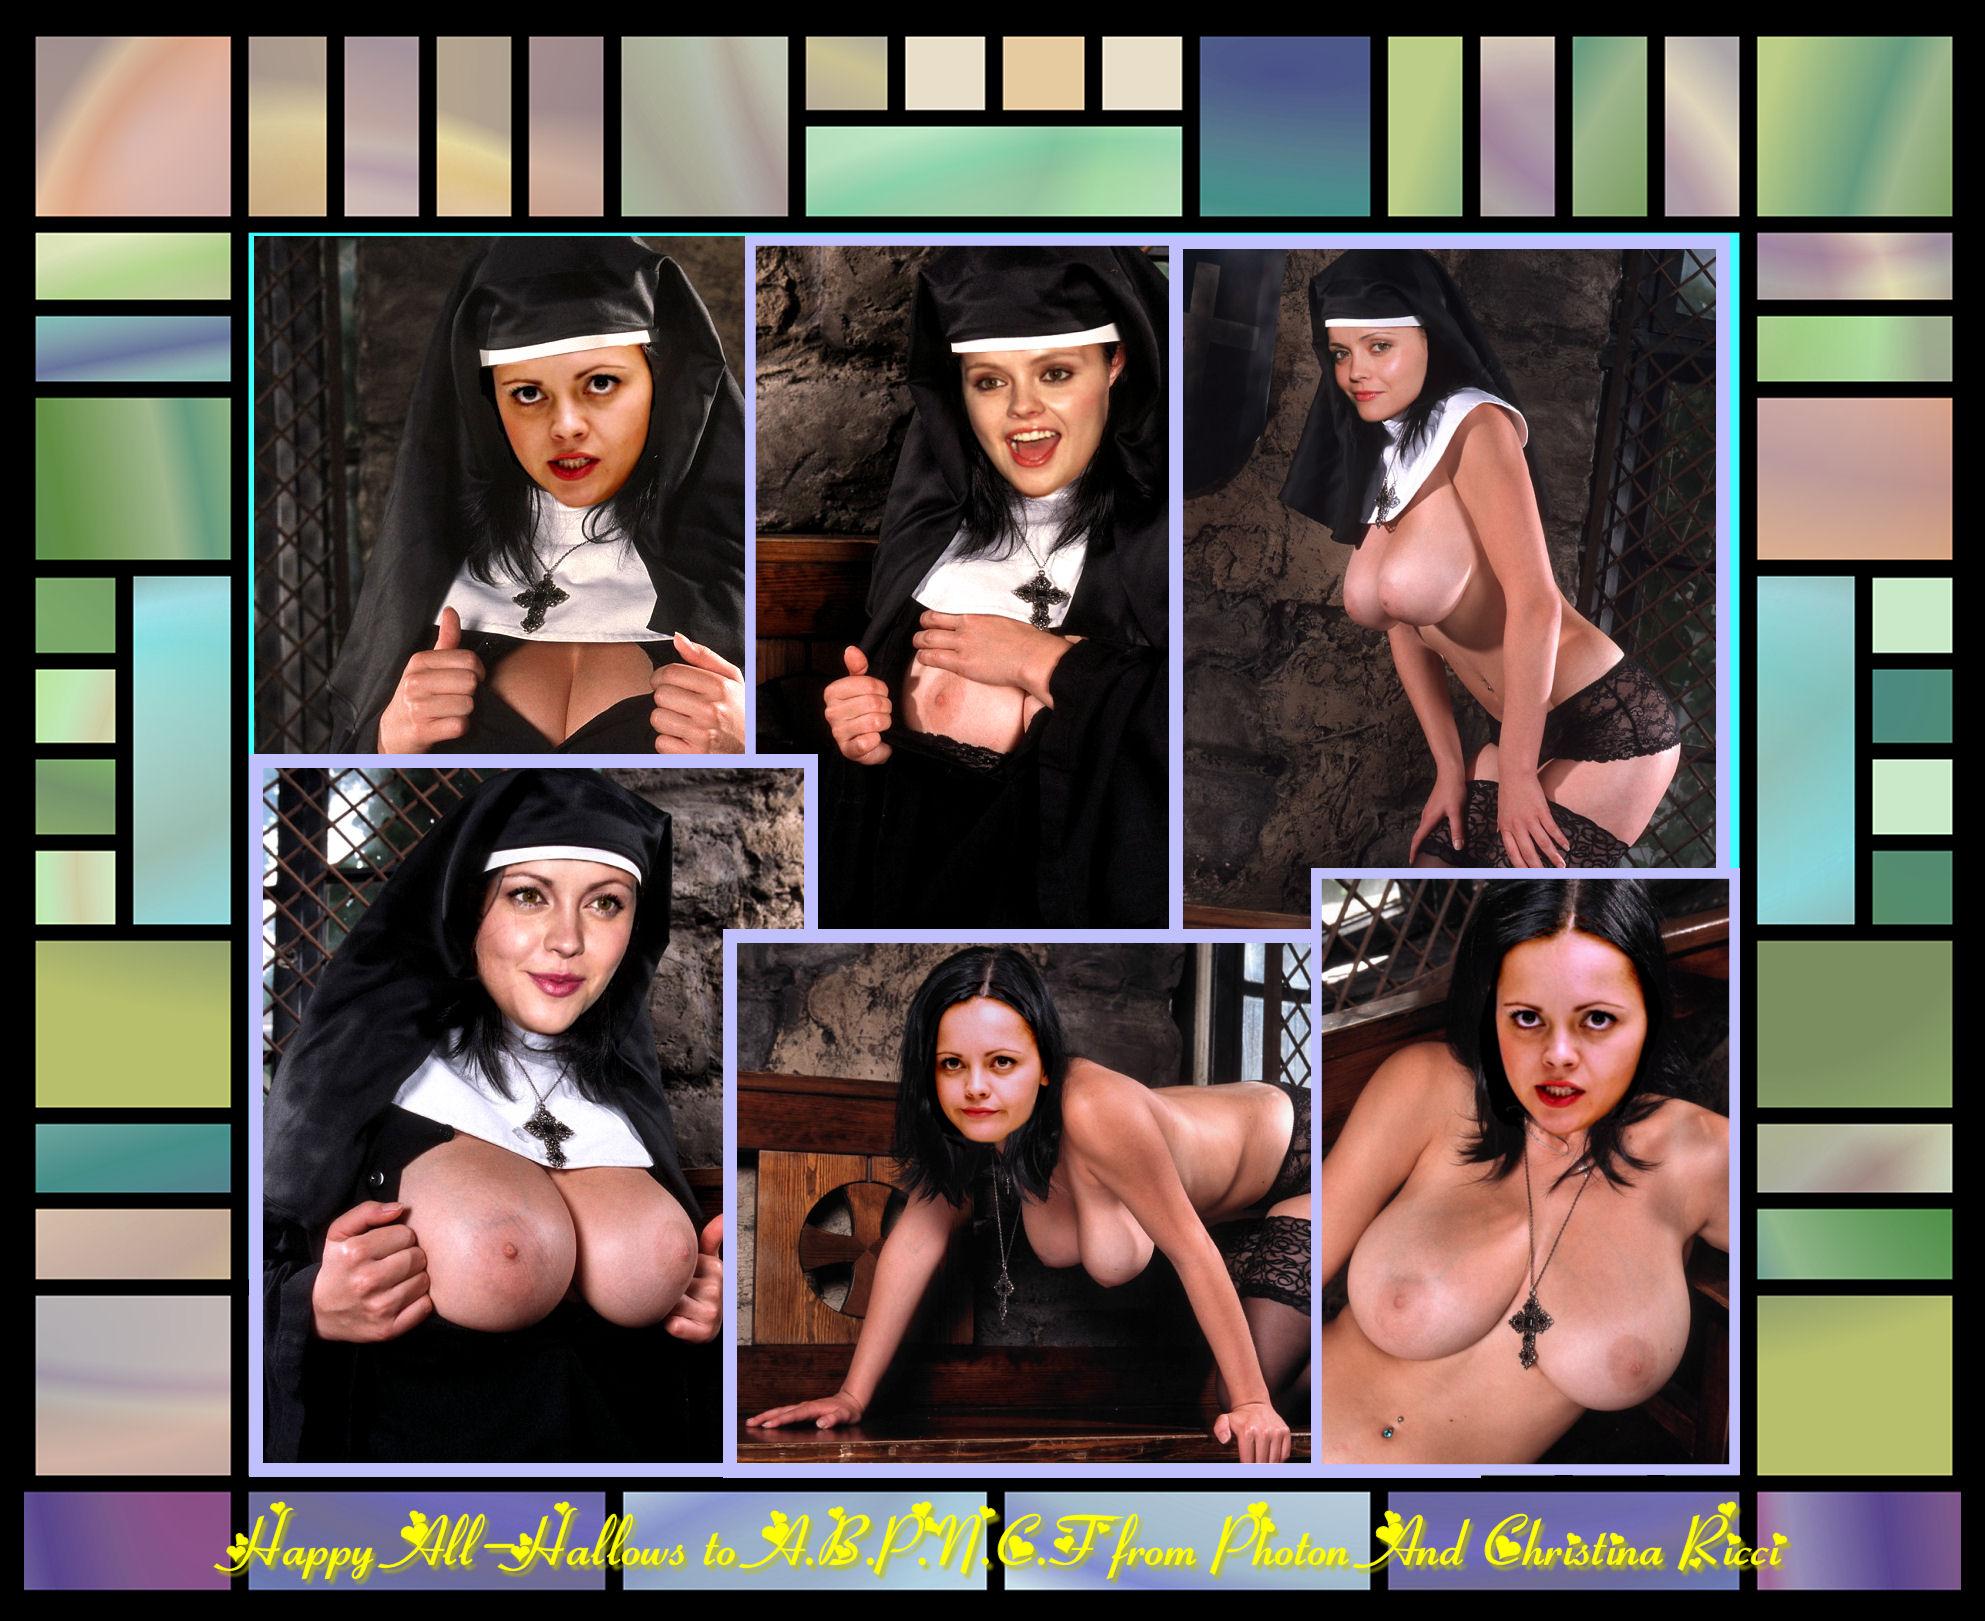 ricci_christina_photon_2006_017.jpg